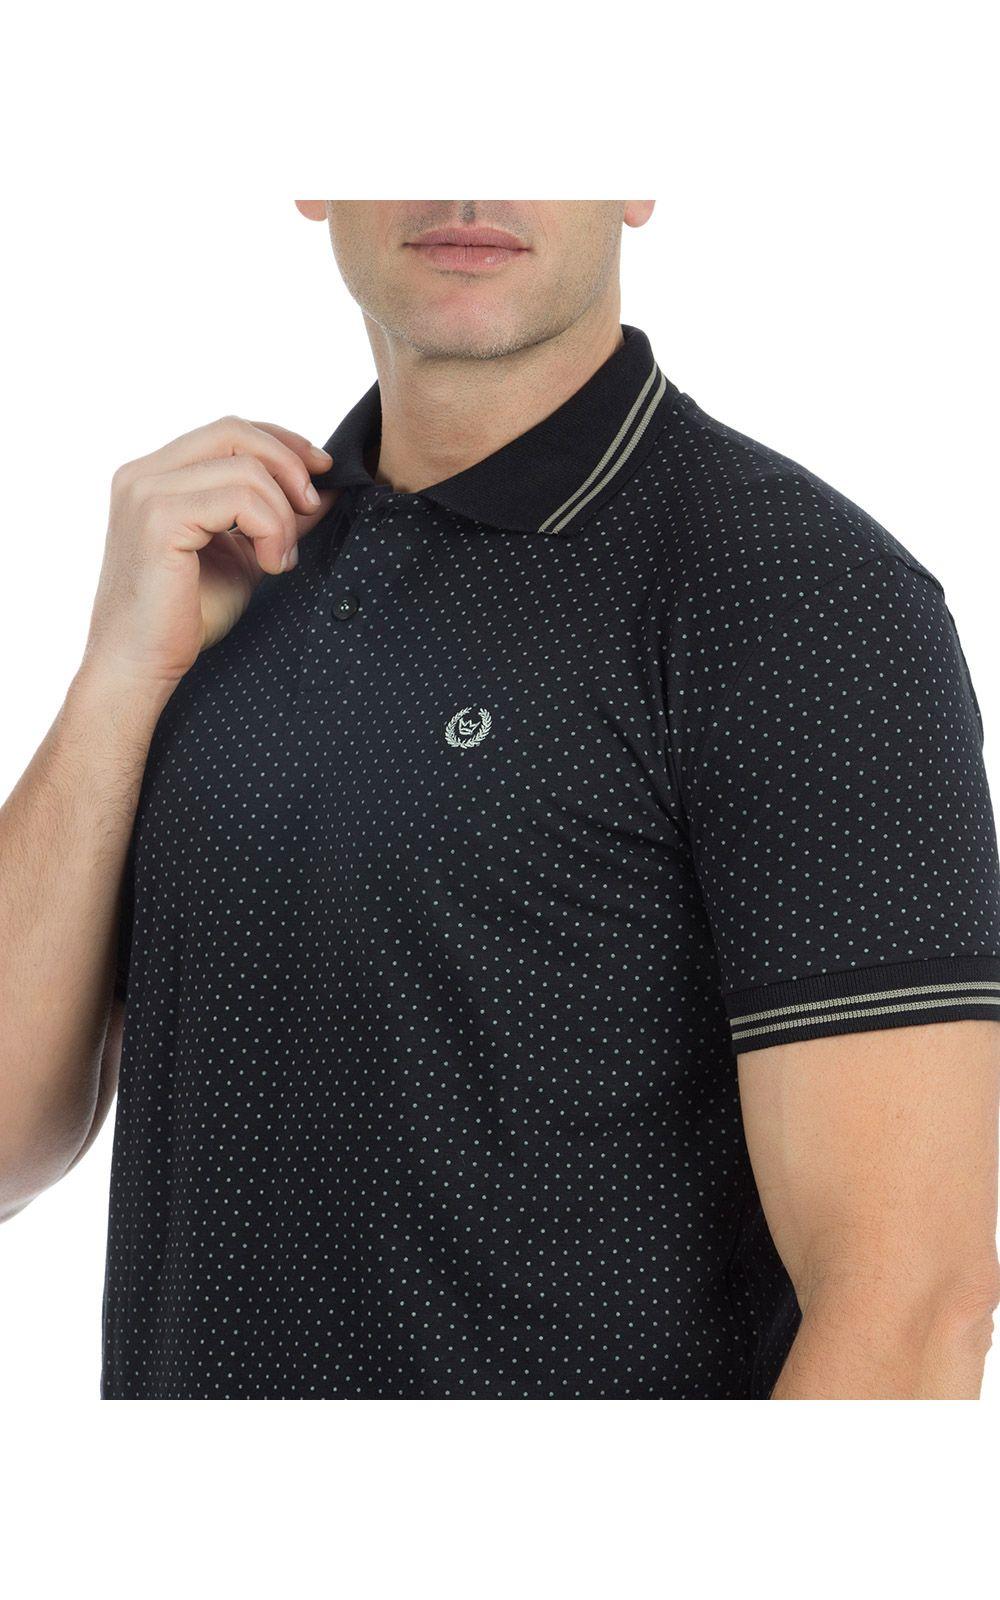 Foto 3 - Camisa Polo Masculina Preta Estampada